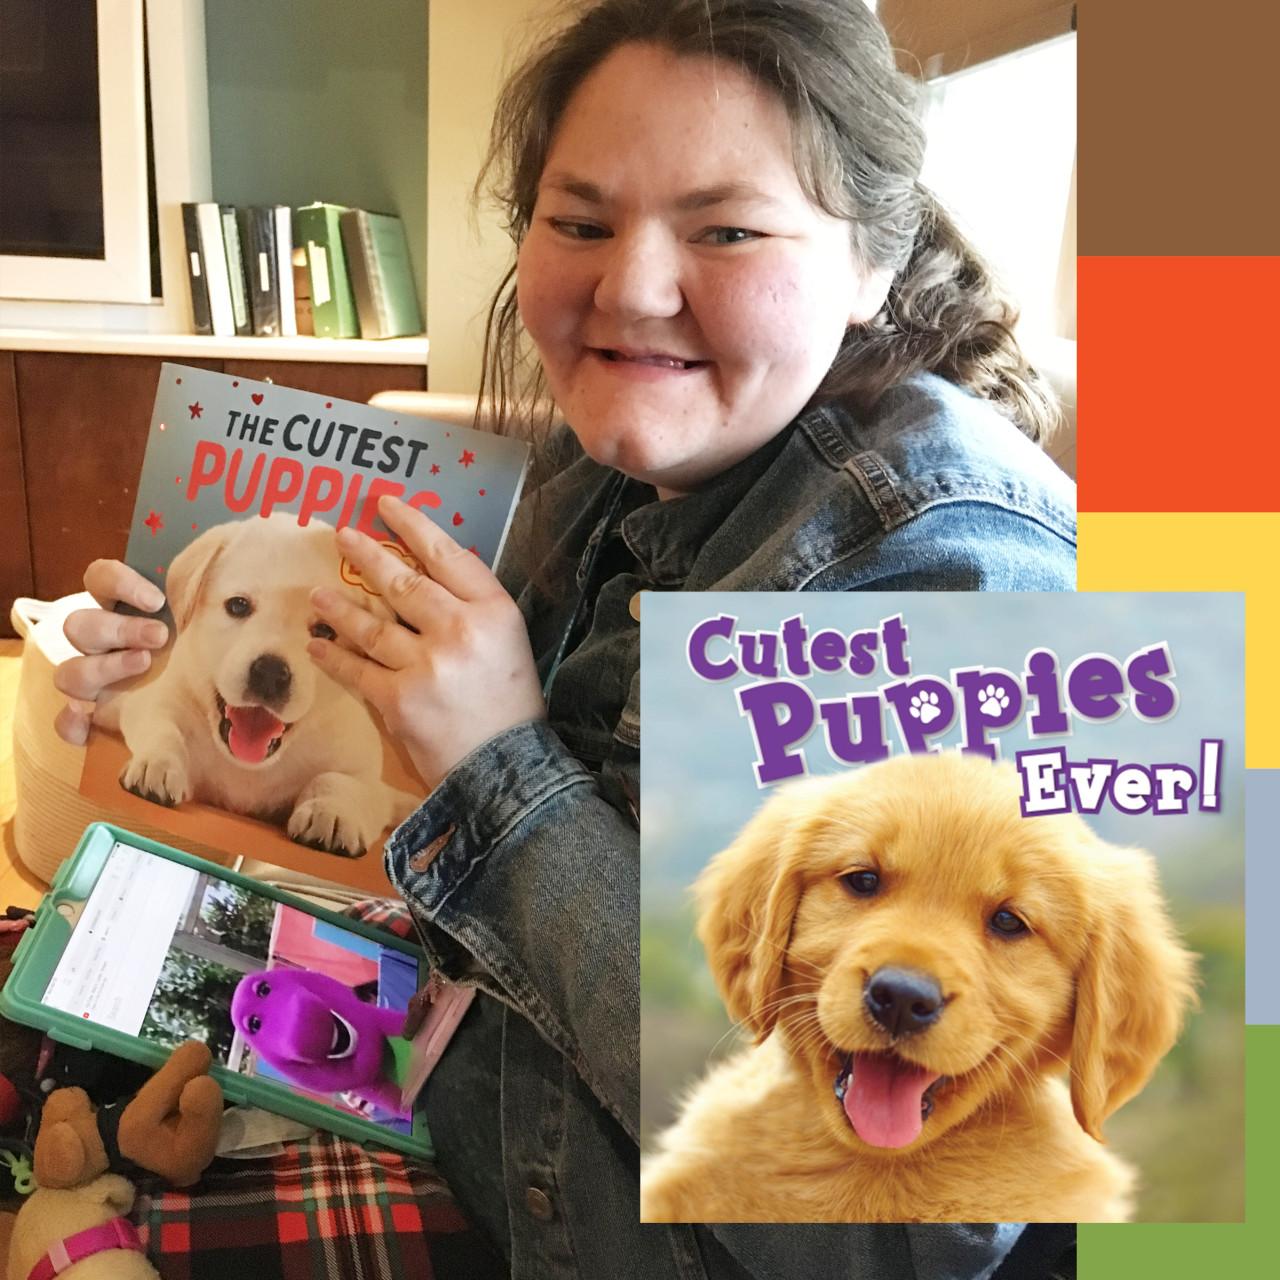 Katie Baker Cutest Puppies Ever png iPIJsk3s - Transportation - Meditation Monday